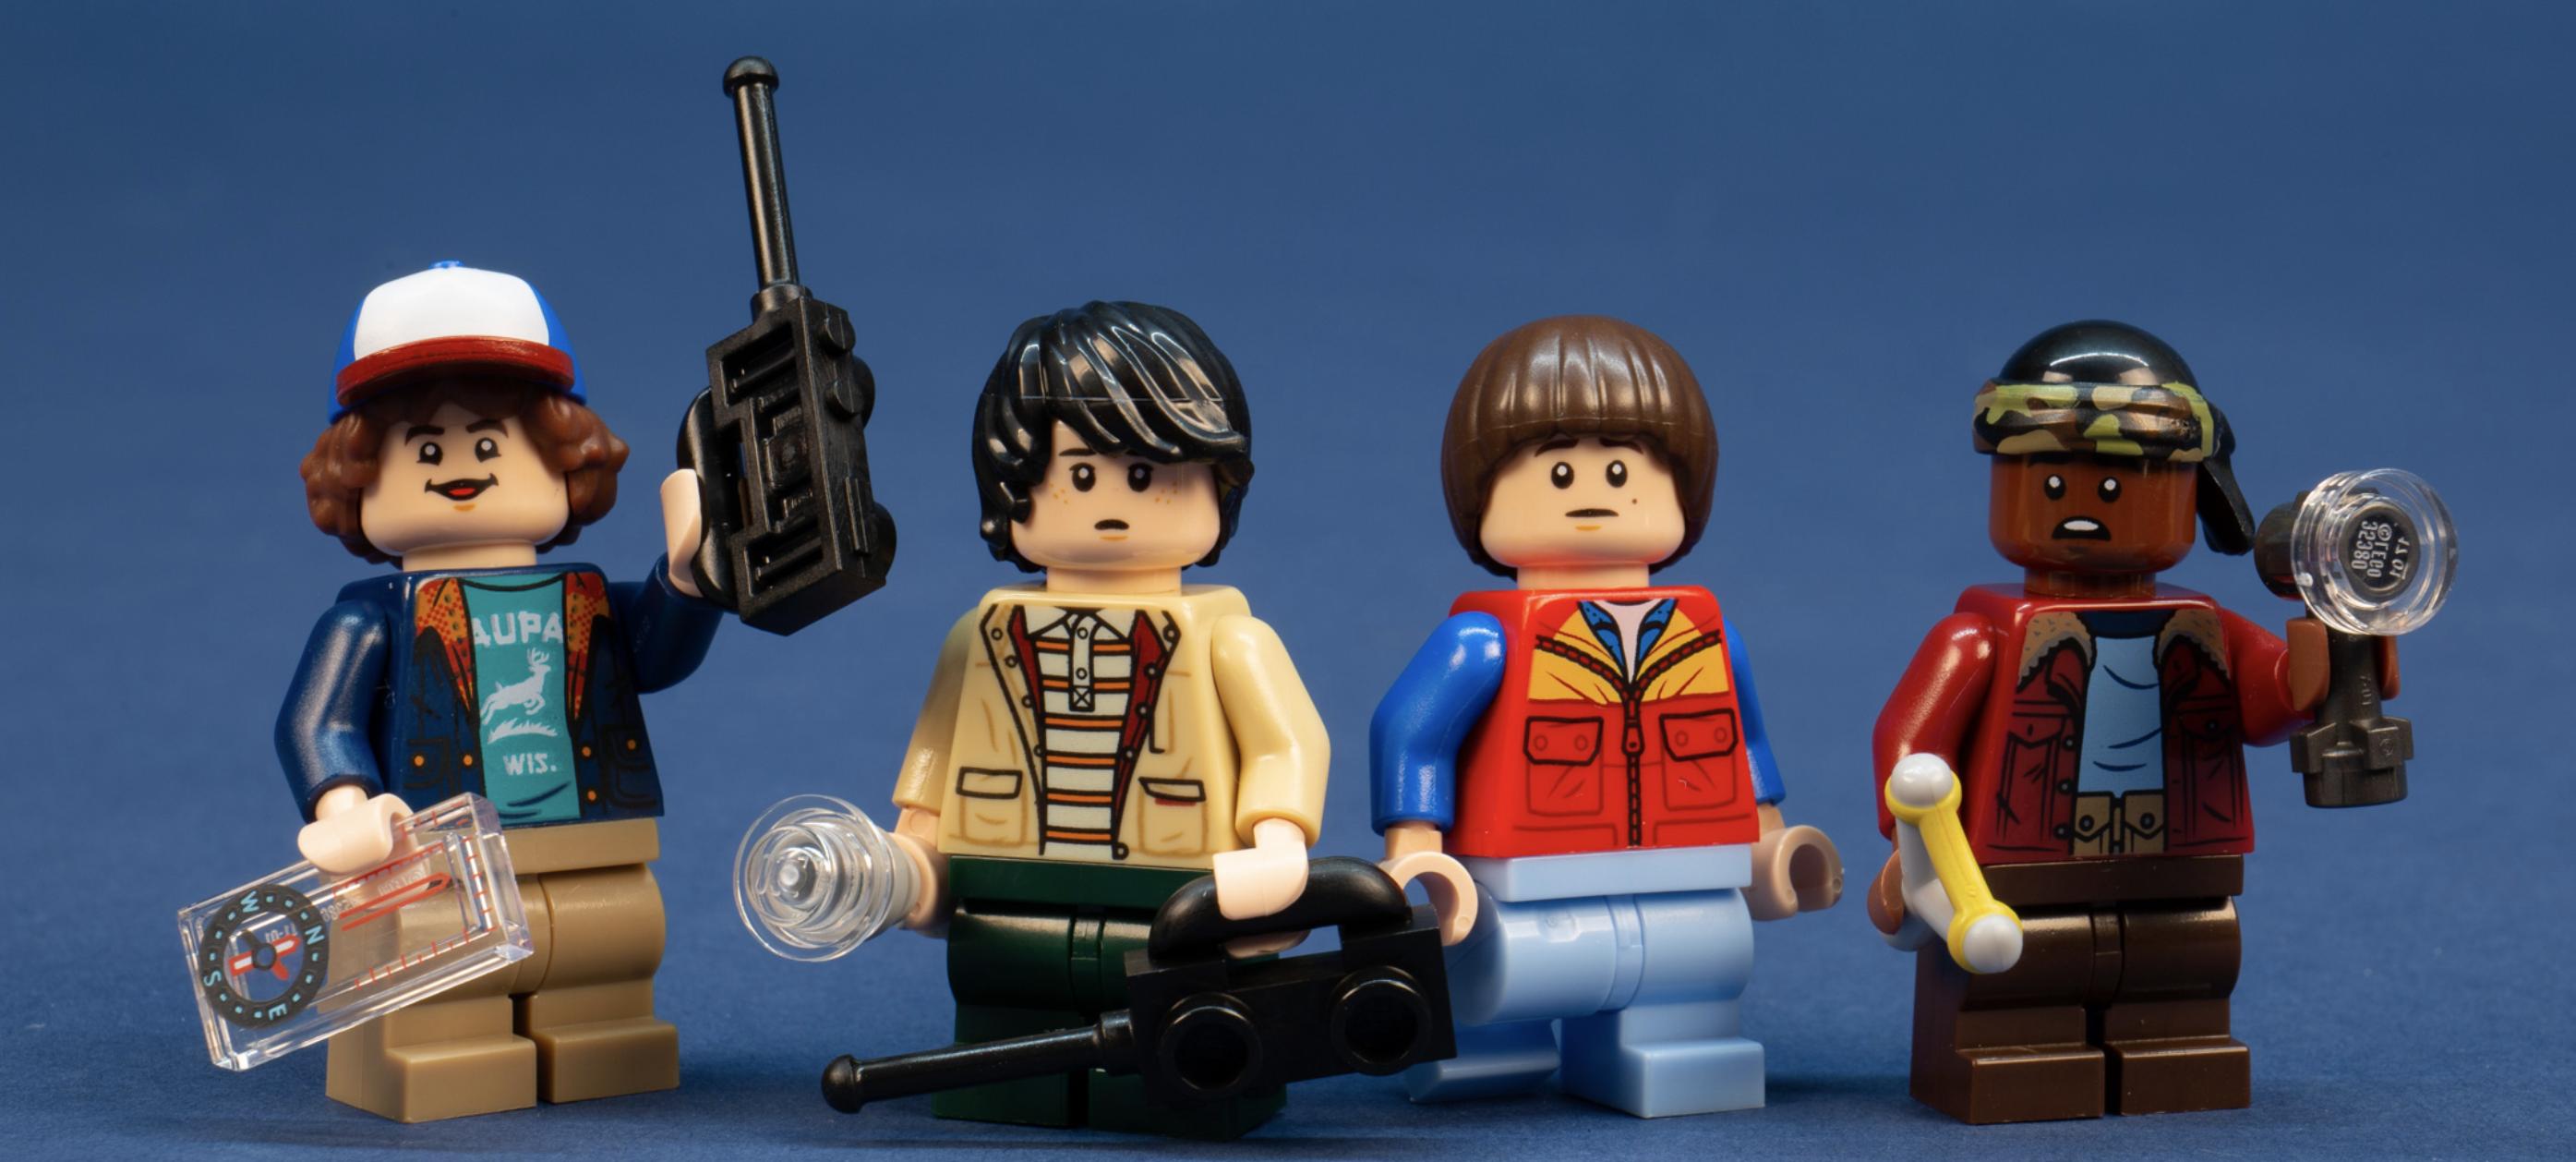 LEGO sorprende a los fans de Stranger Things